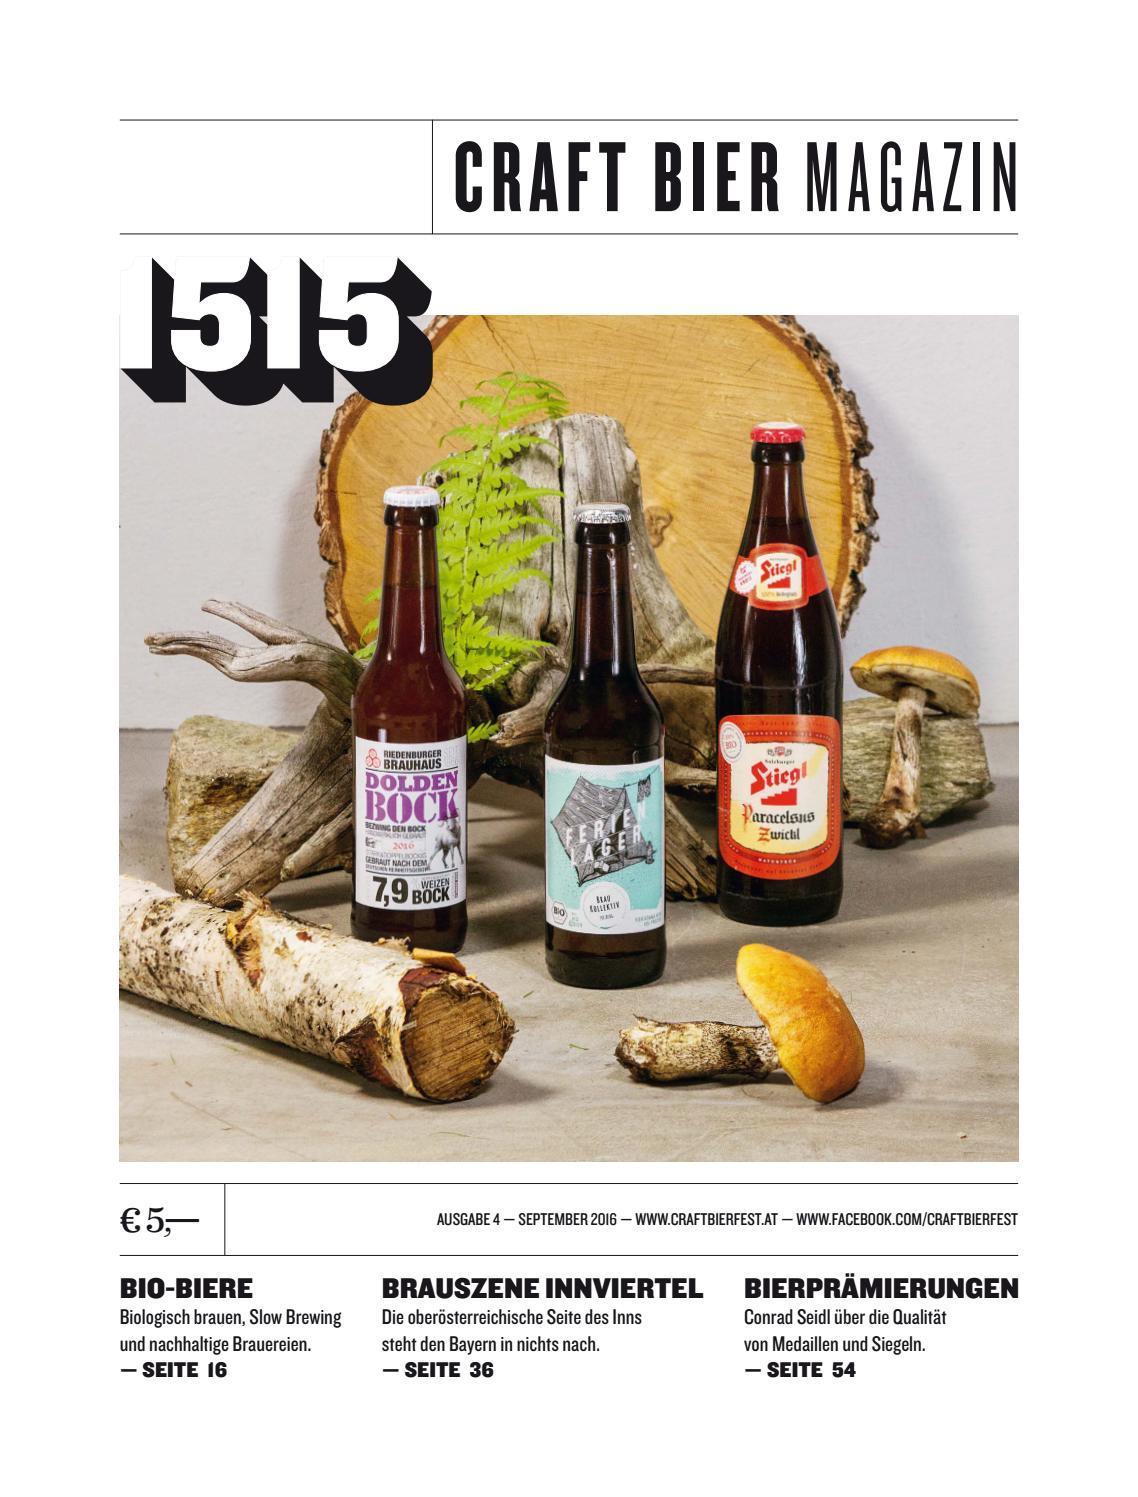 1515 Craft Bier Magazin #04 – September/Oktober 2016 by Craft Bier ...